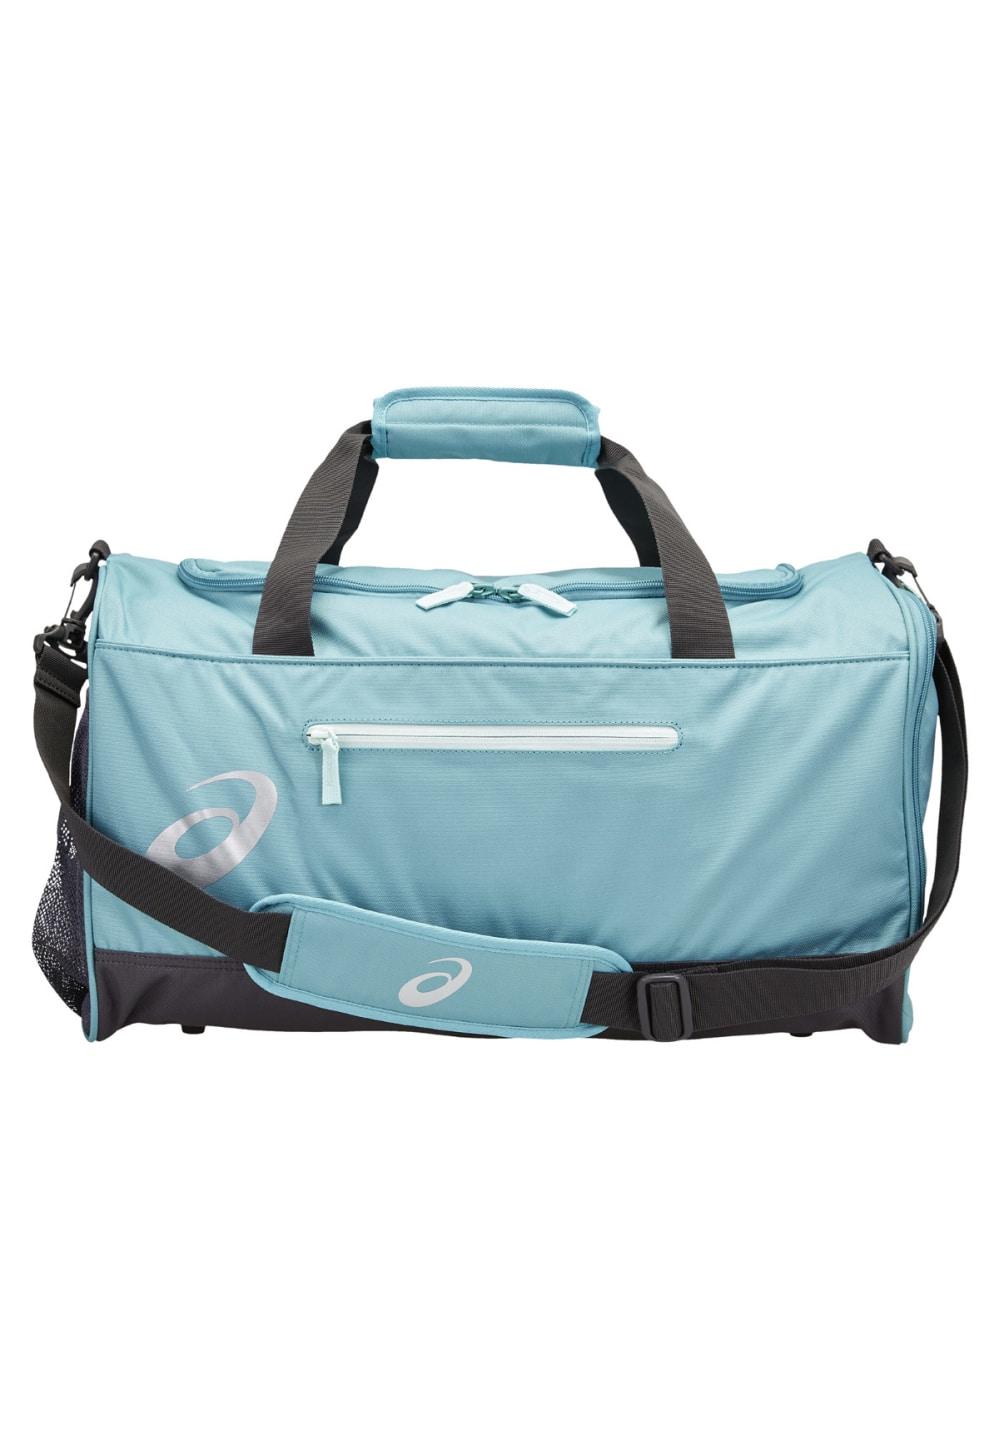 ASICS Tr Core Holdall Sporttaschen - Blau